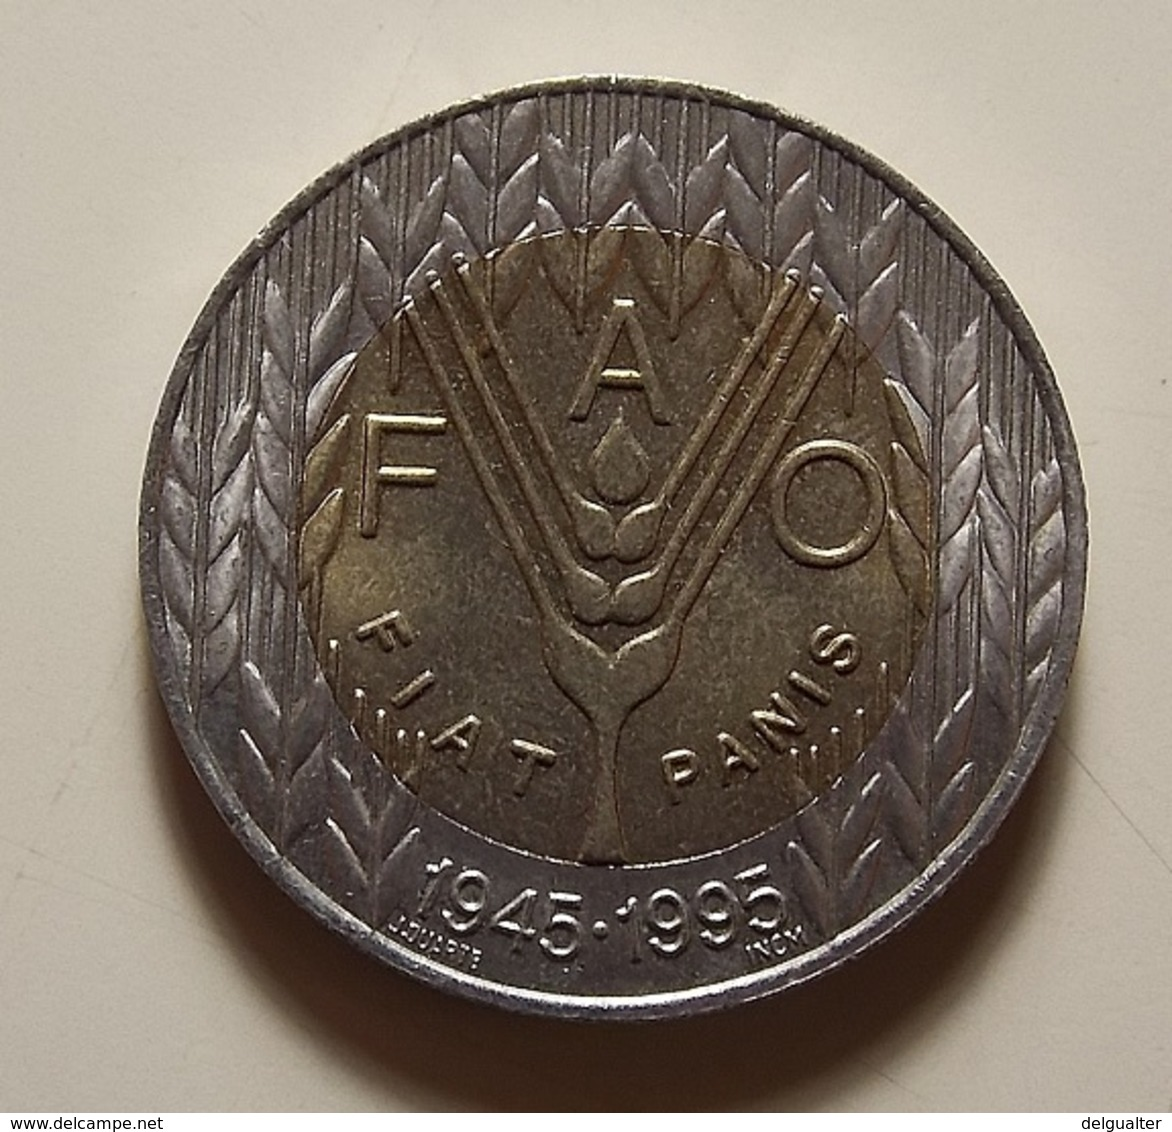 Portugal 100 Escudos FAO - Portugal